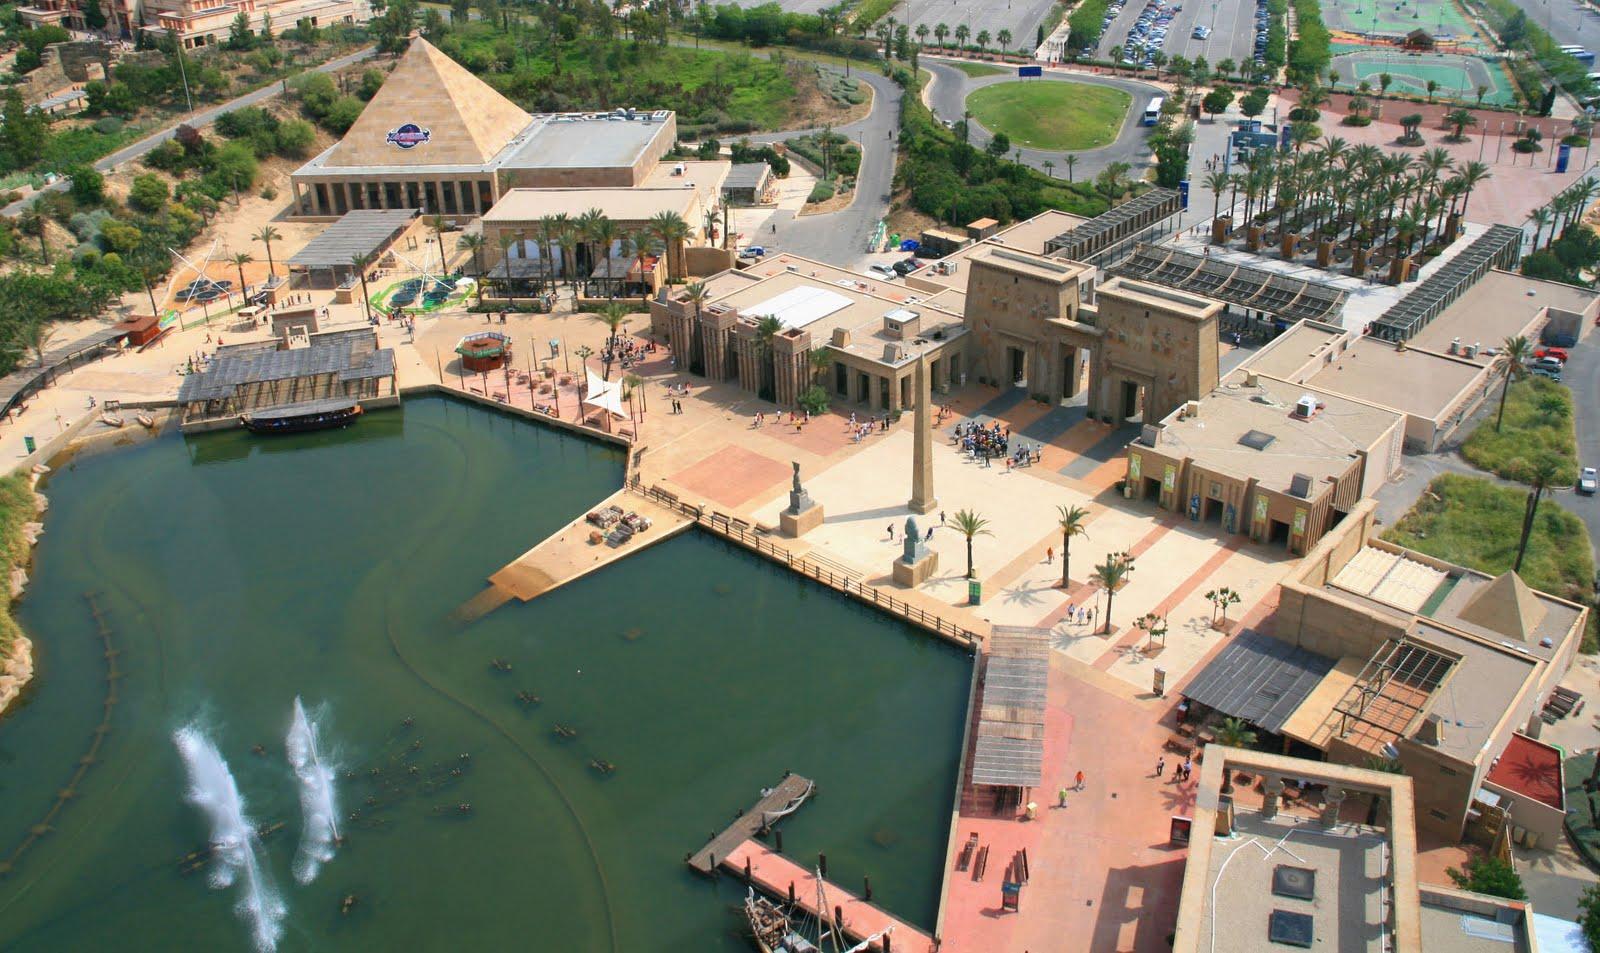 JEFFERSON WORLD TRIP: WELCOME TO BENIDORM - Spain.